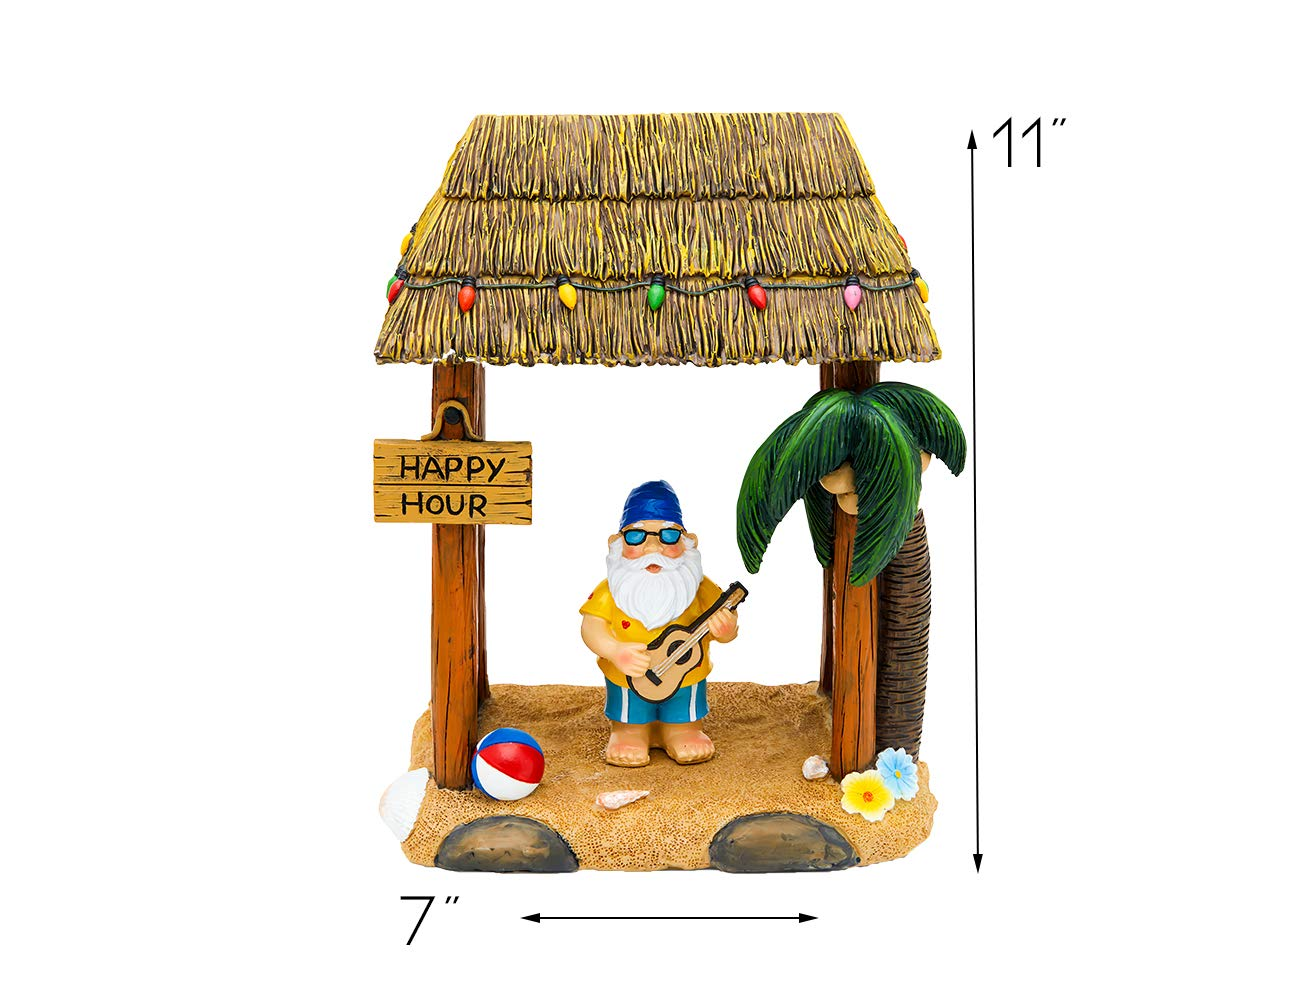 Tiki Beach Party Garden Gnome Statue Home Outdoor Garden Lawn Funny Figure Tropical Great Gifts